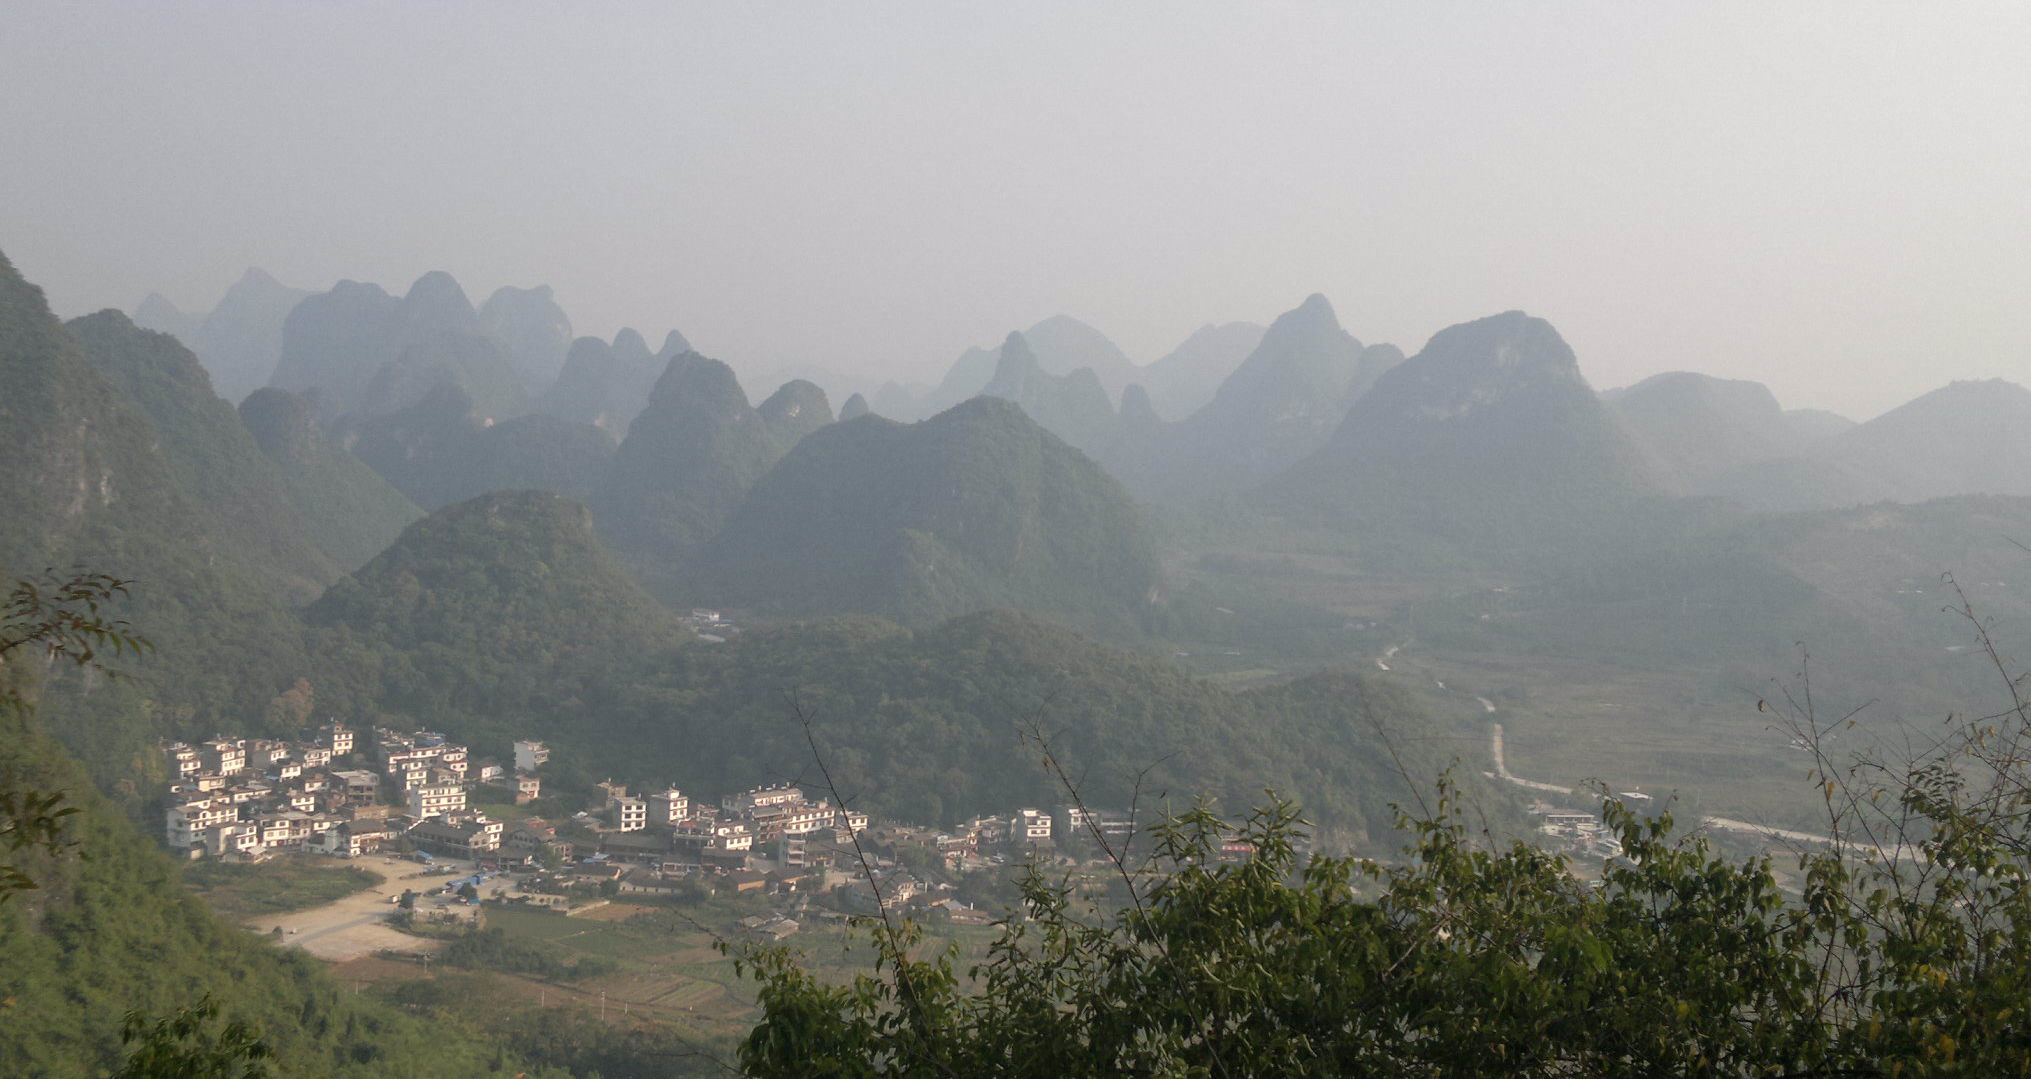 yangshuo-county-2011-11-05-894_1